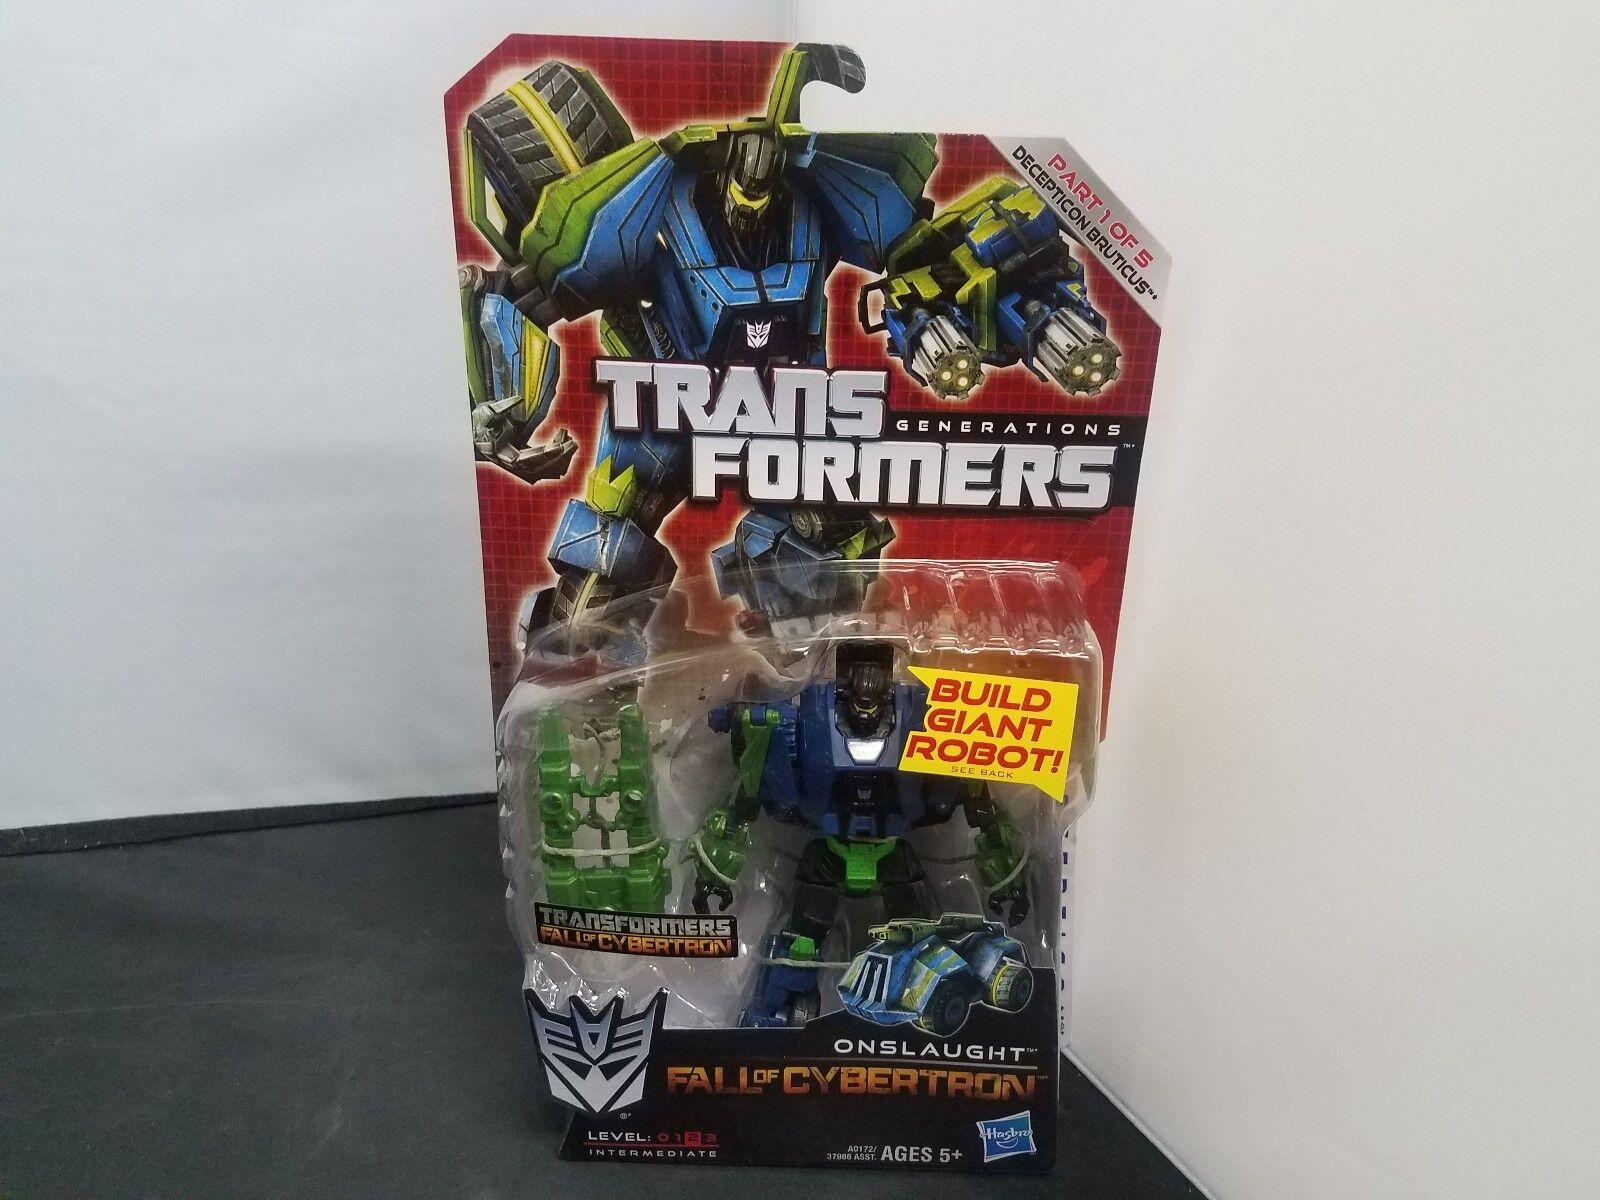 Hasbro Transformers Generations - Ftutti of Cybertron -  Deluxe, Onslaught... NOSC  è scontato